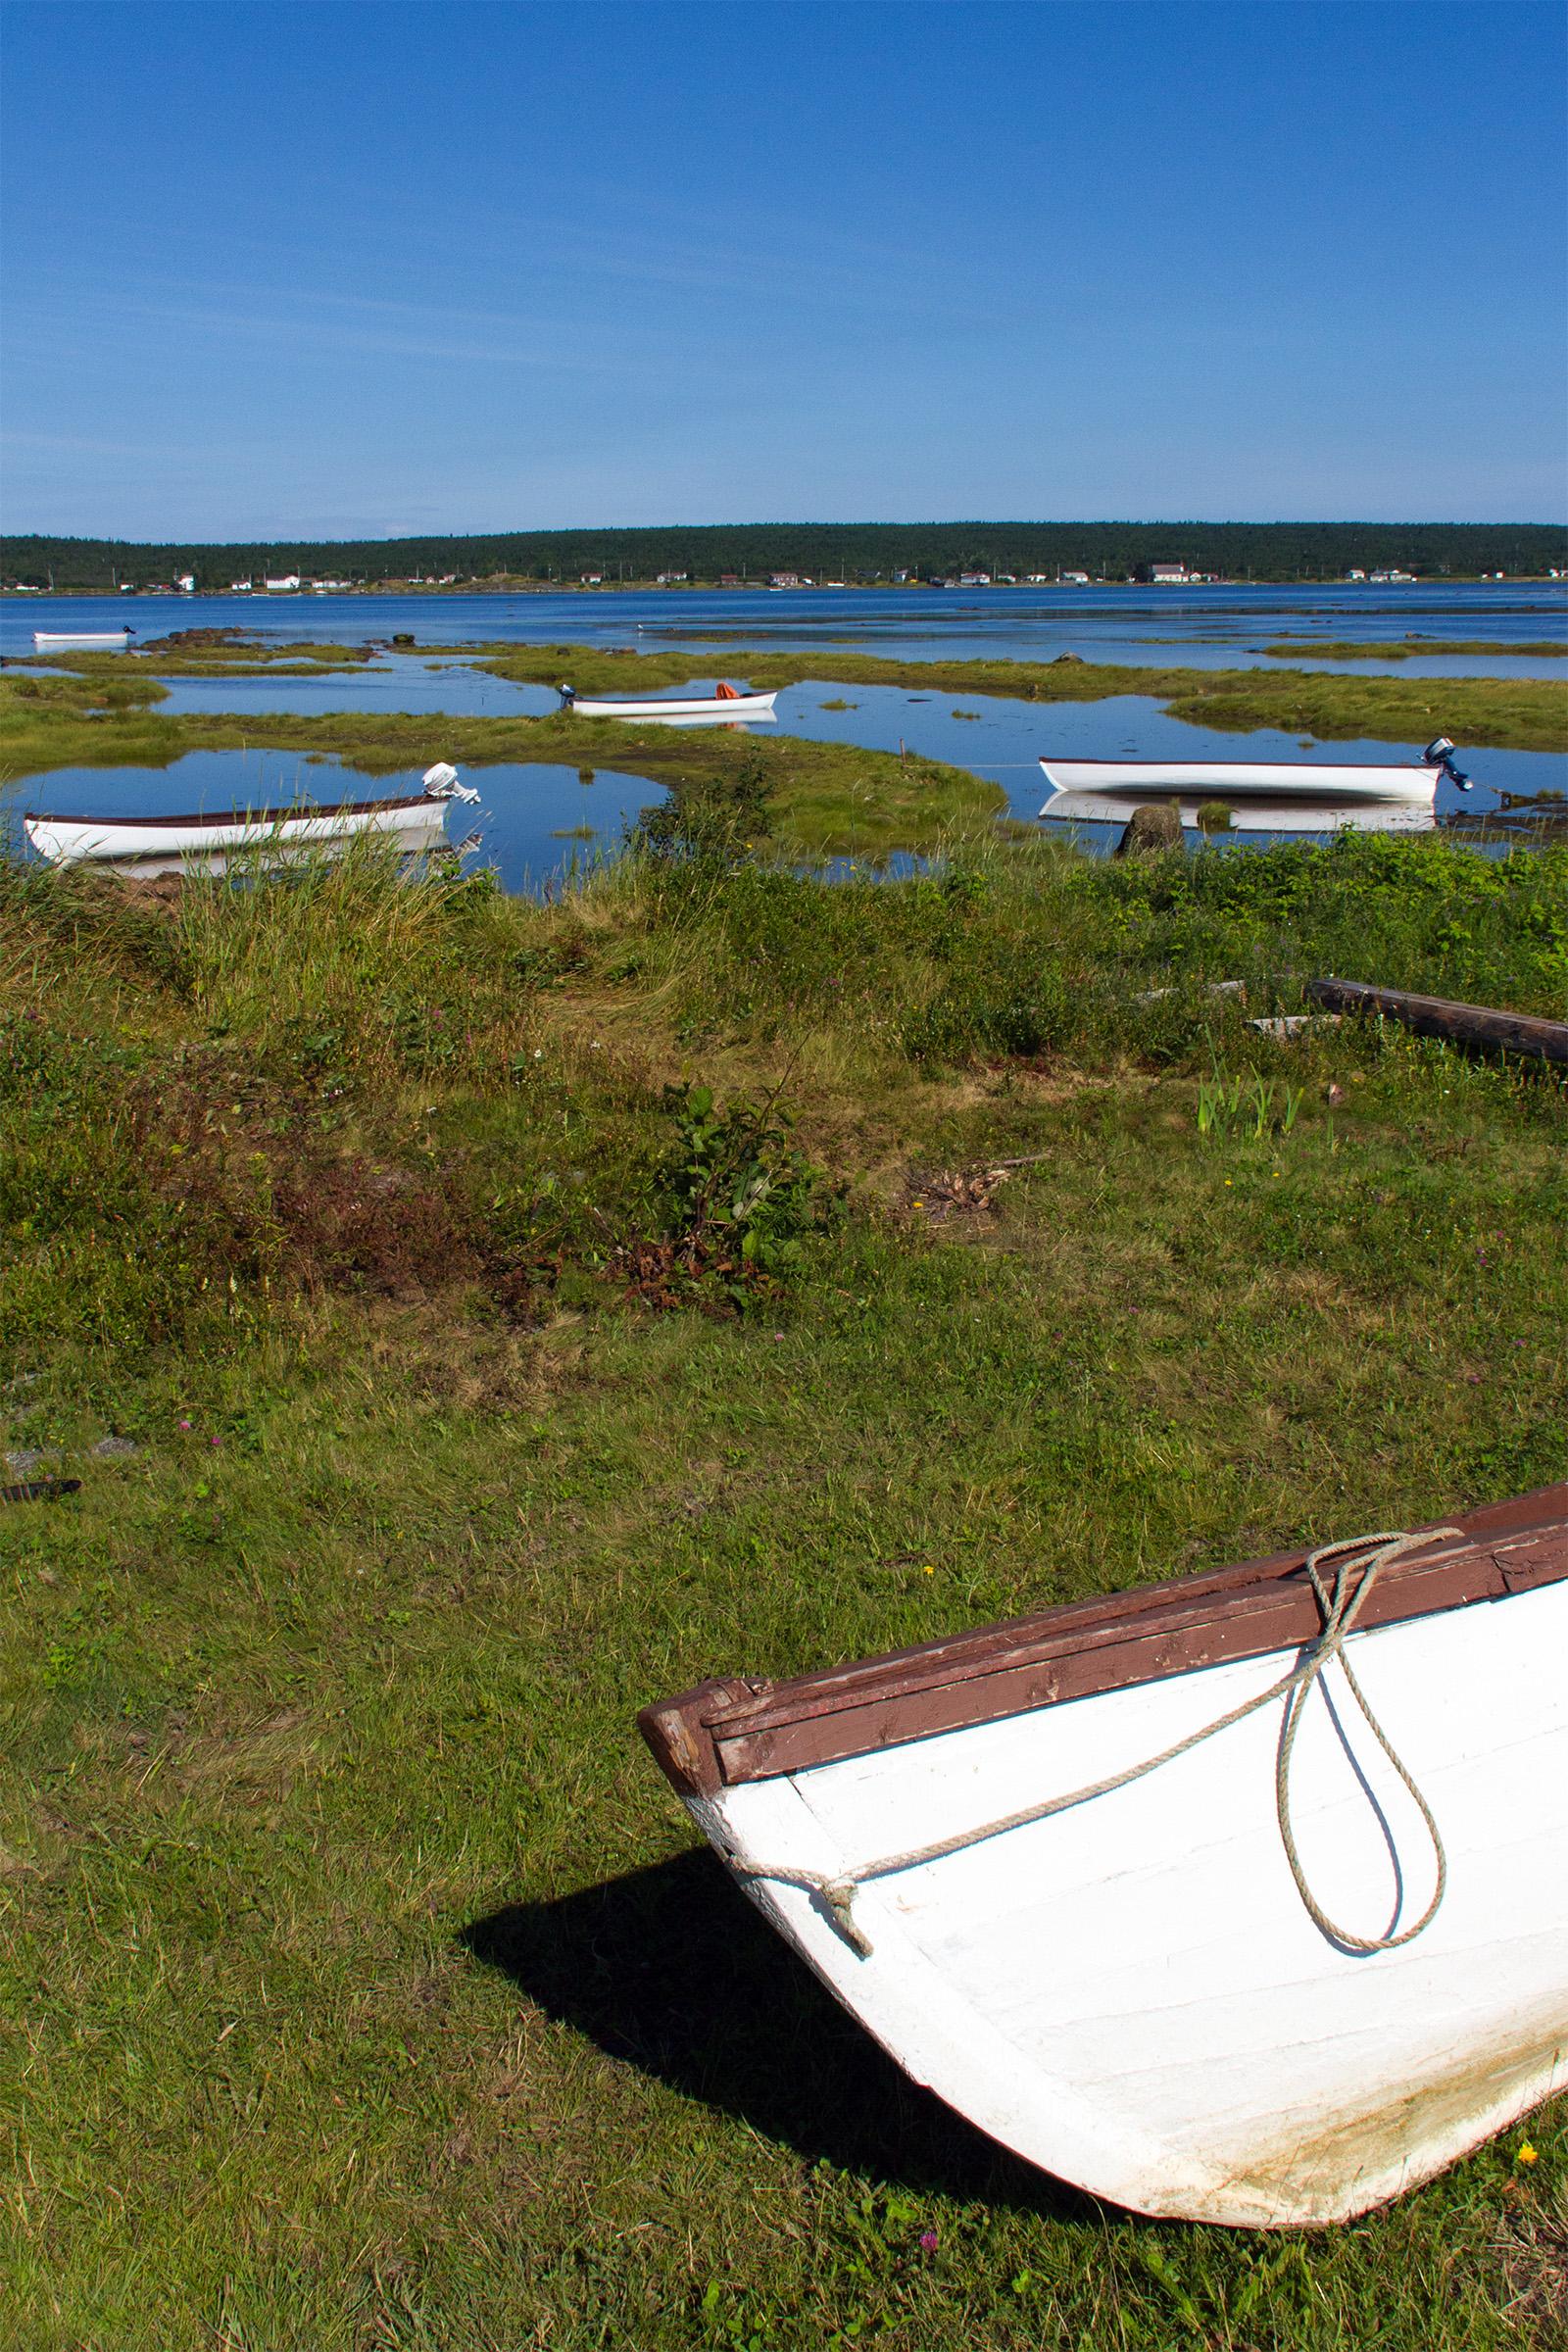 Boat, Air, Space, River, Rural, HQ Photo